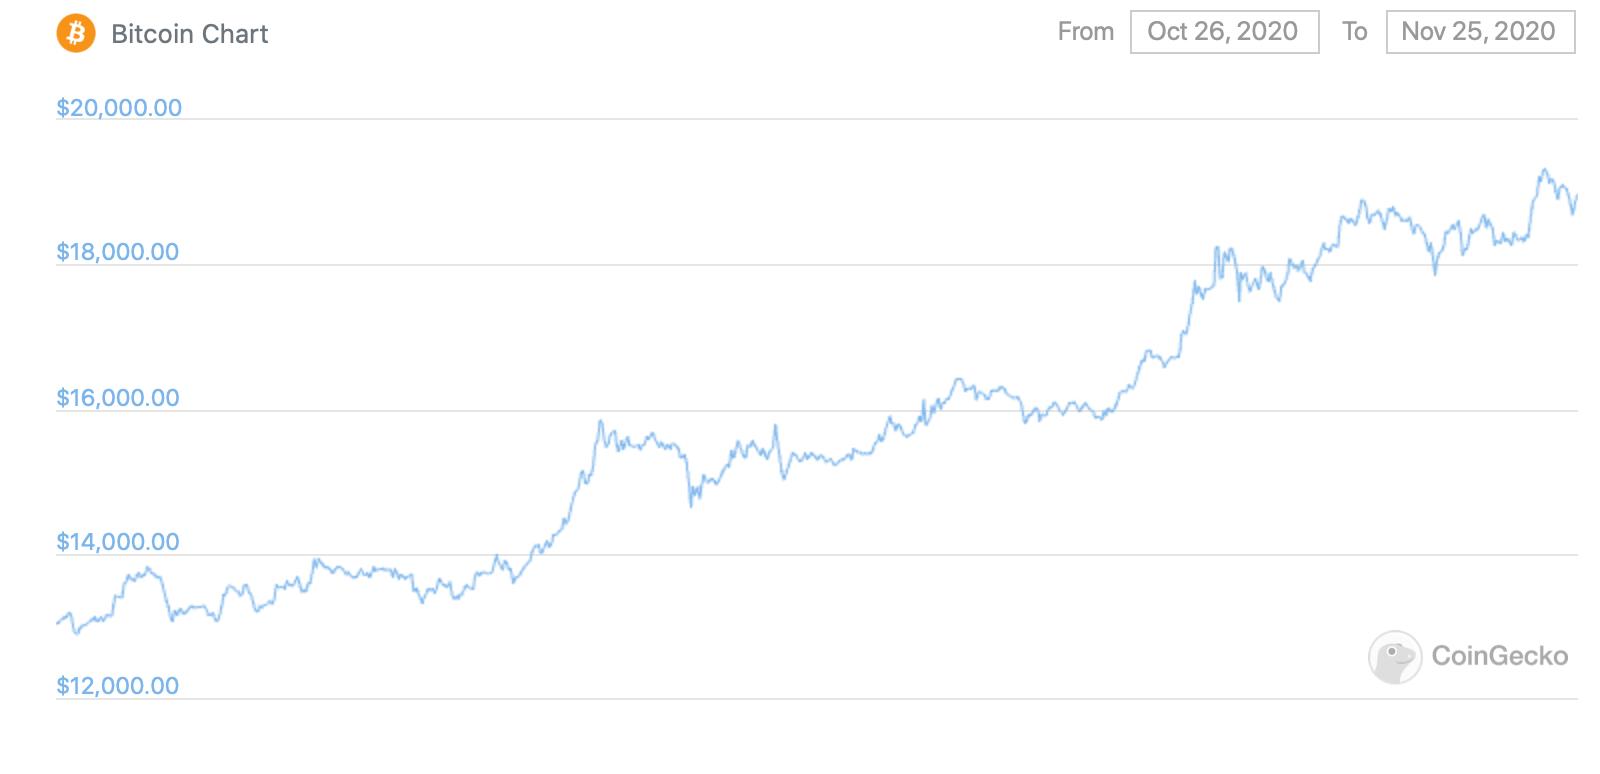 График курса Биткоина за месяц